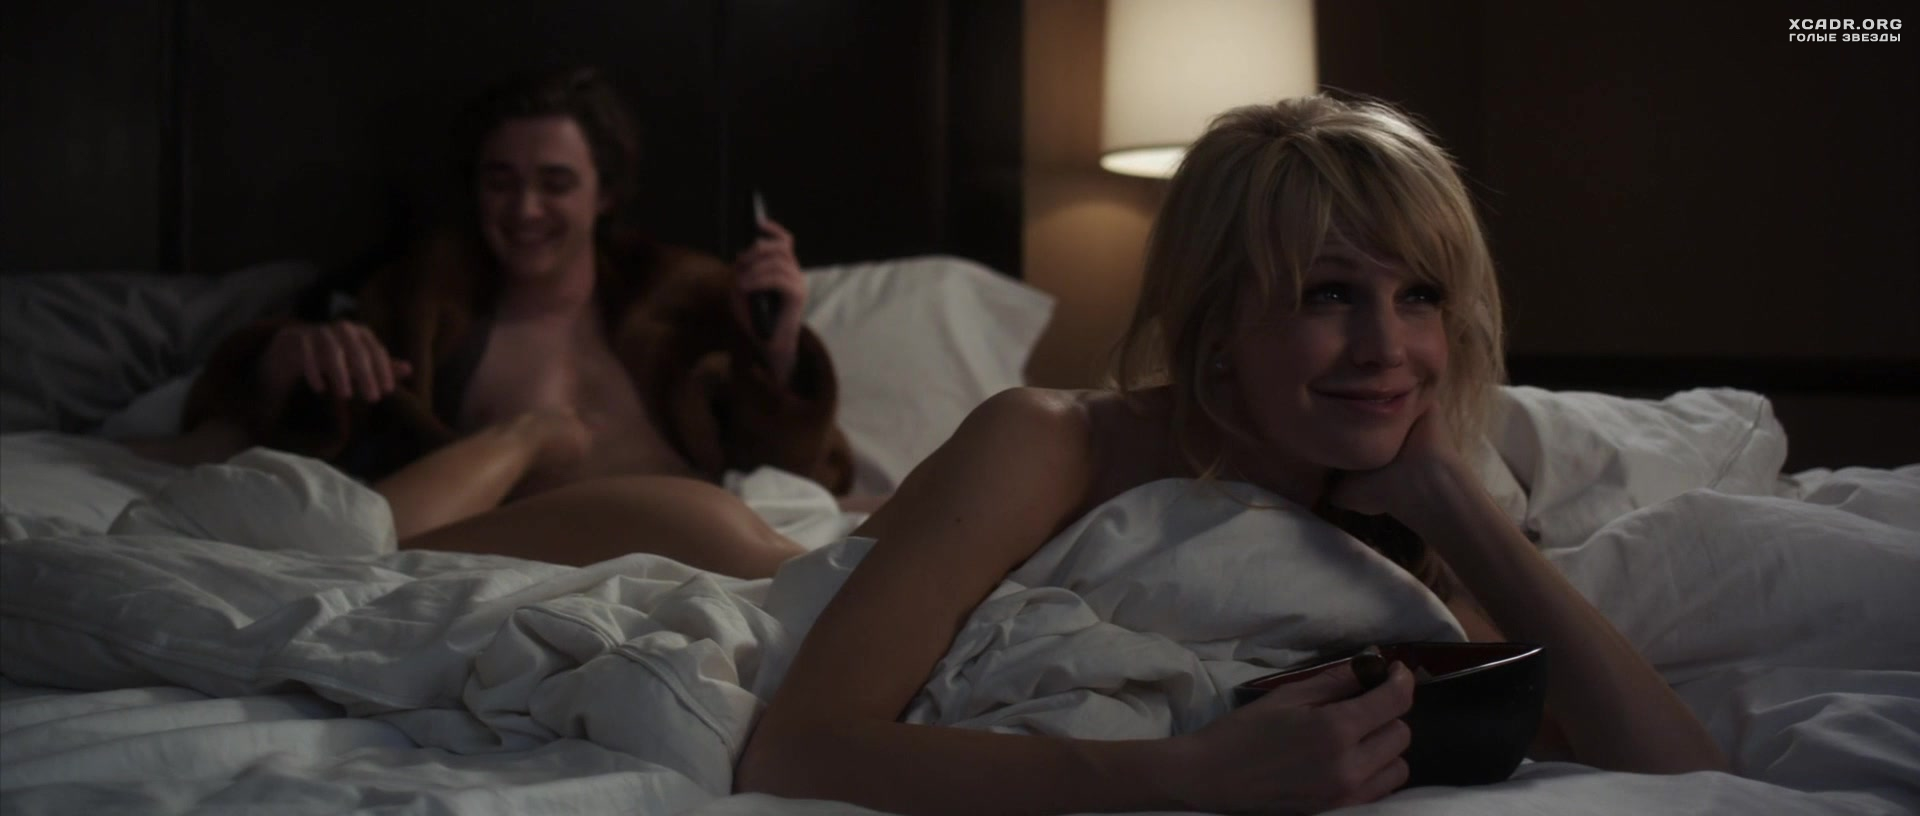 Kathryn morris naked sex — photo 15